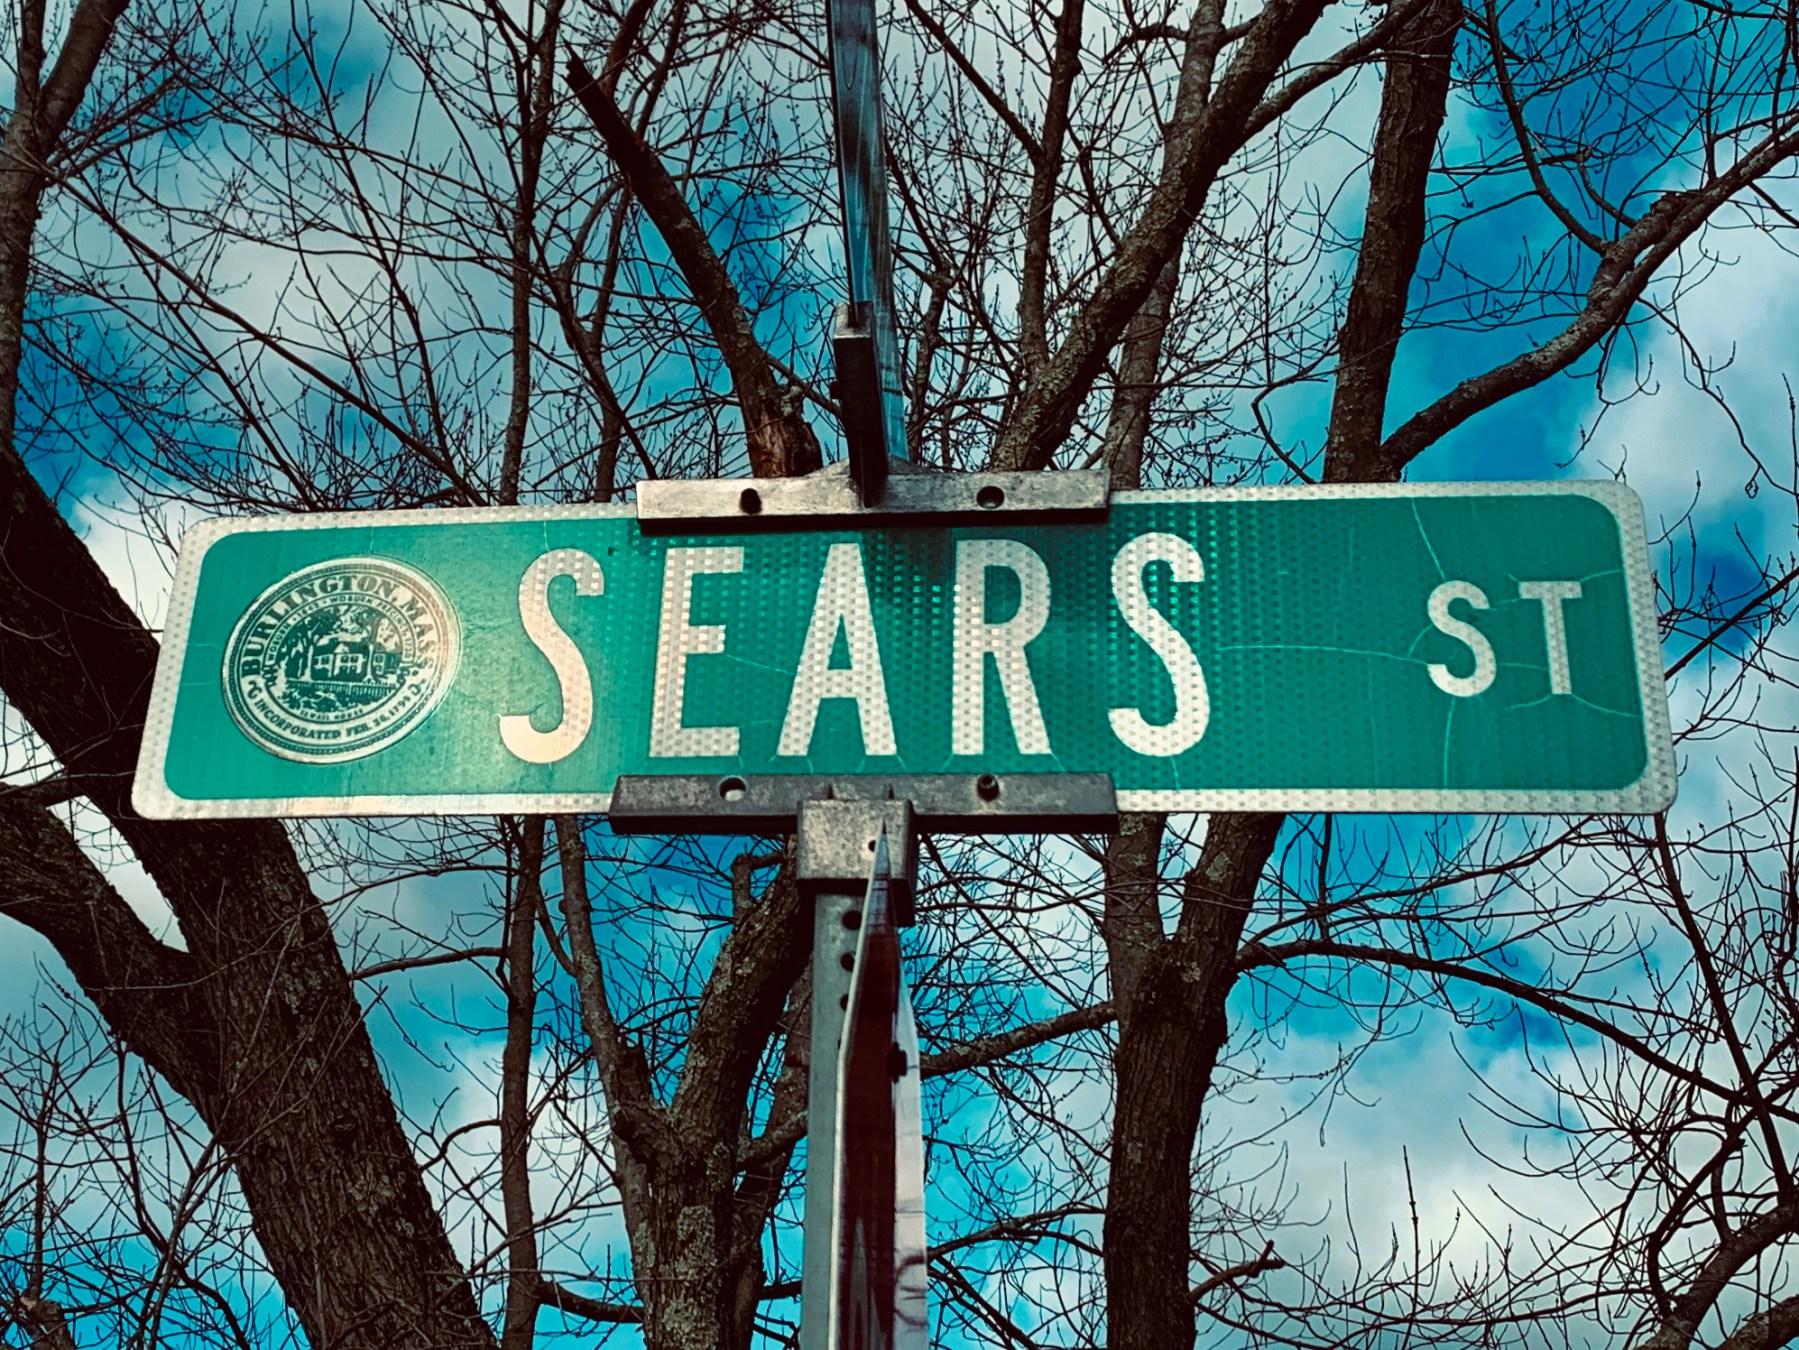 Sears Street sign